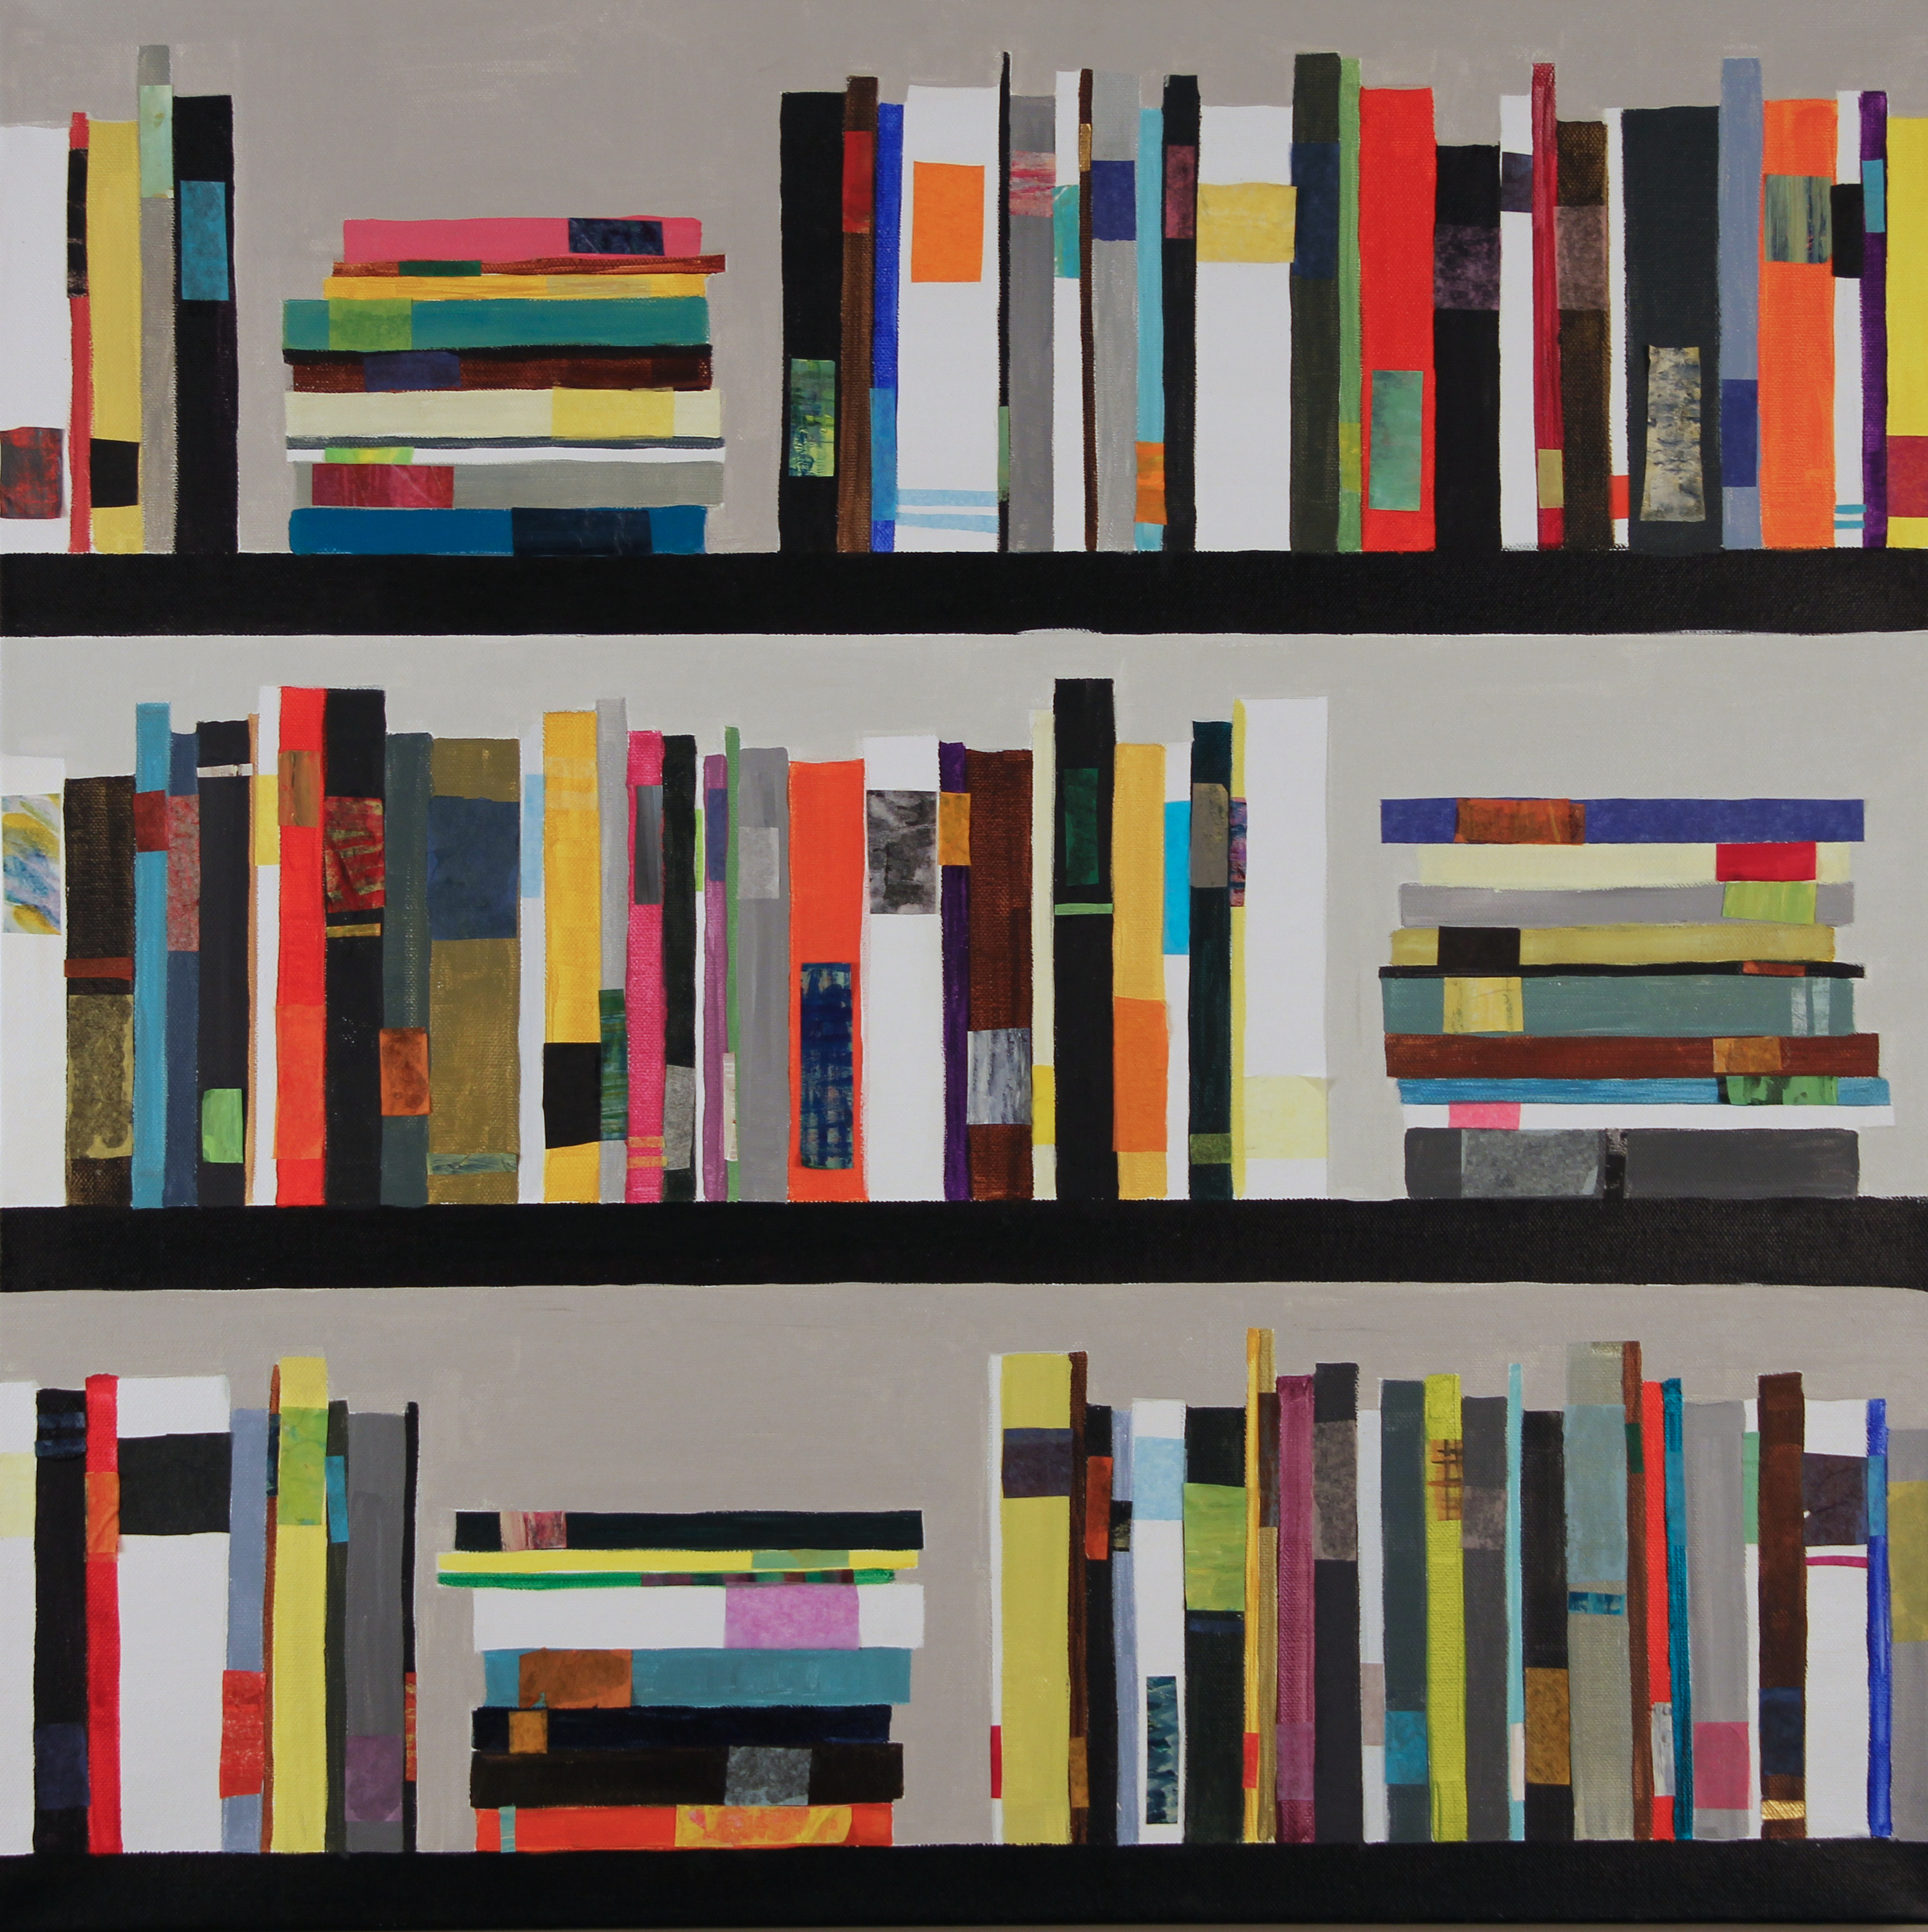 128 volumes.jpg